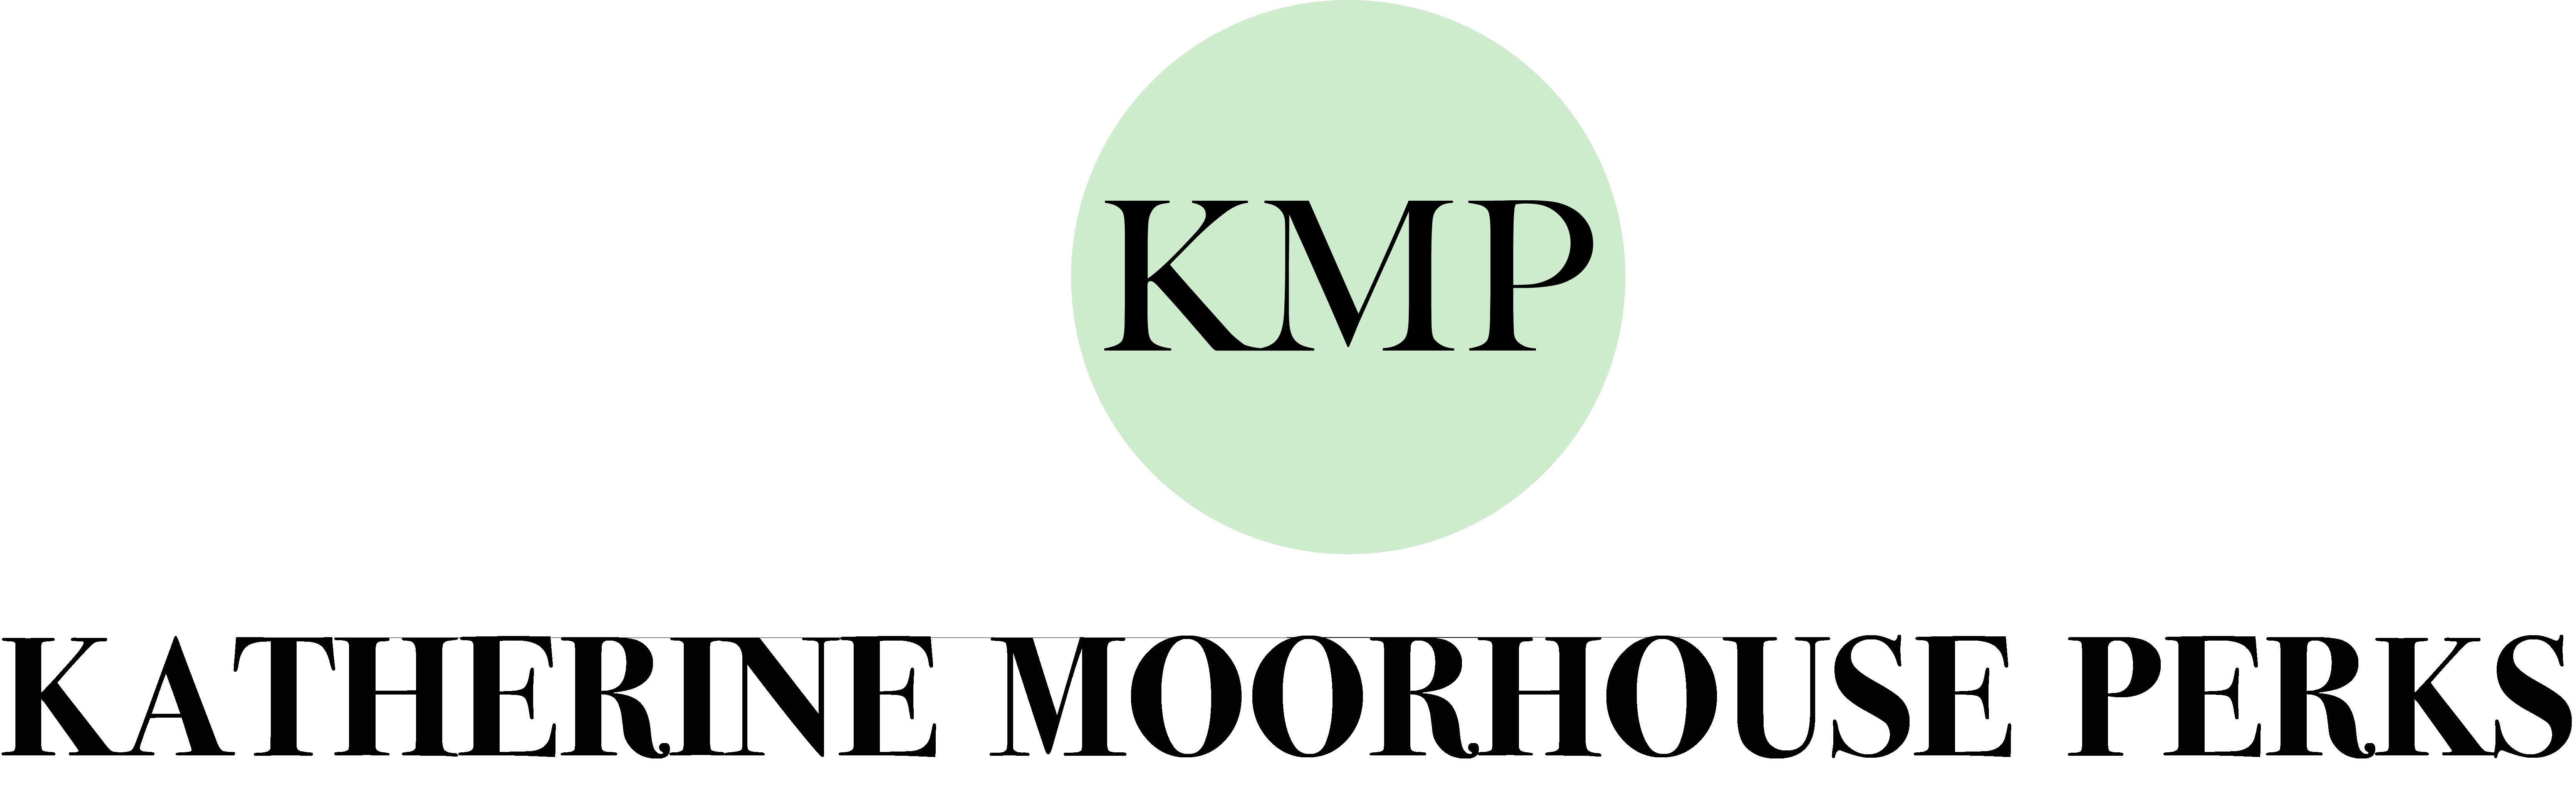 Katherine Moorhouse Perks